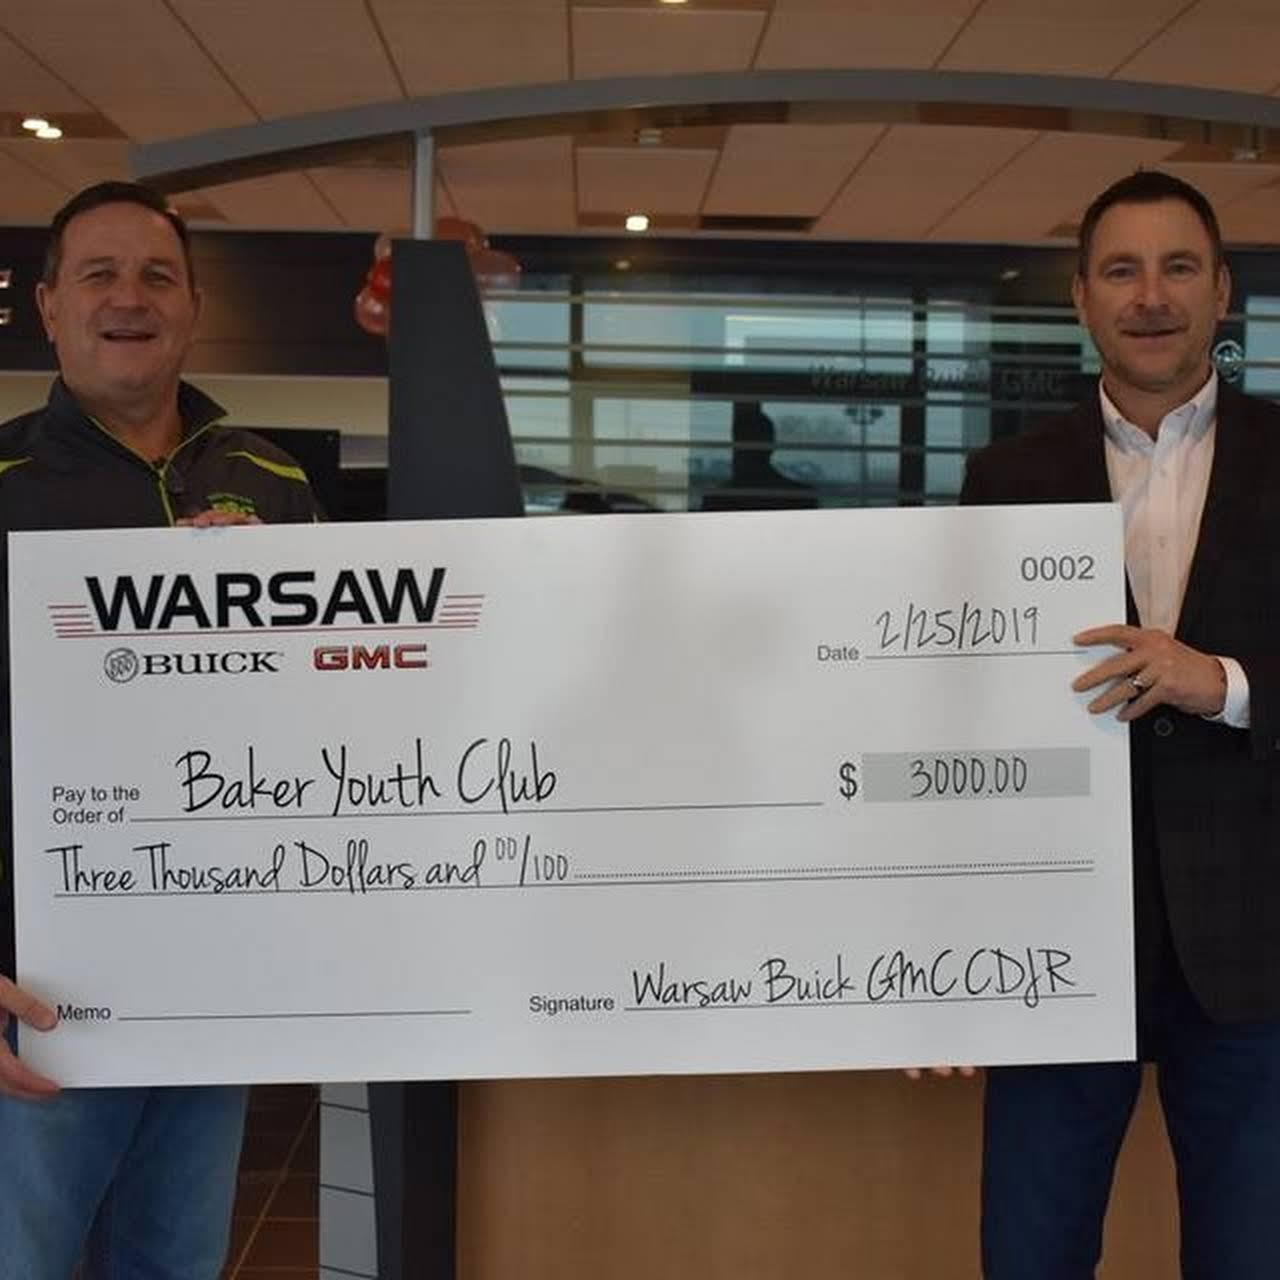 Warsaw Buick Gmc >> Warsaw Buick Gmc Car Dealer In Warsaw